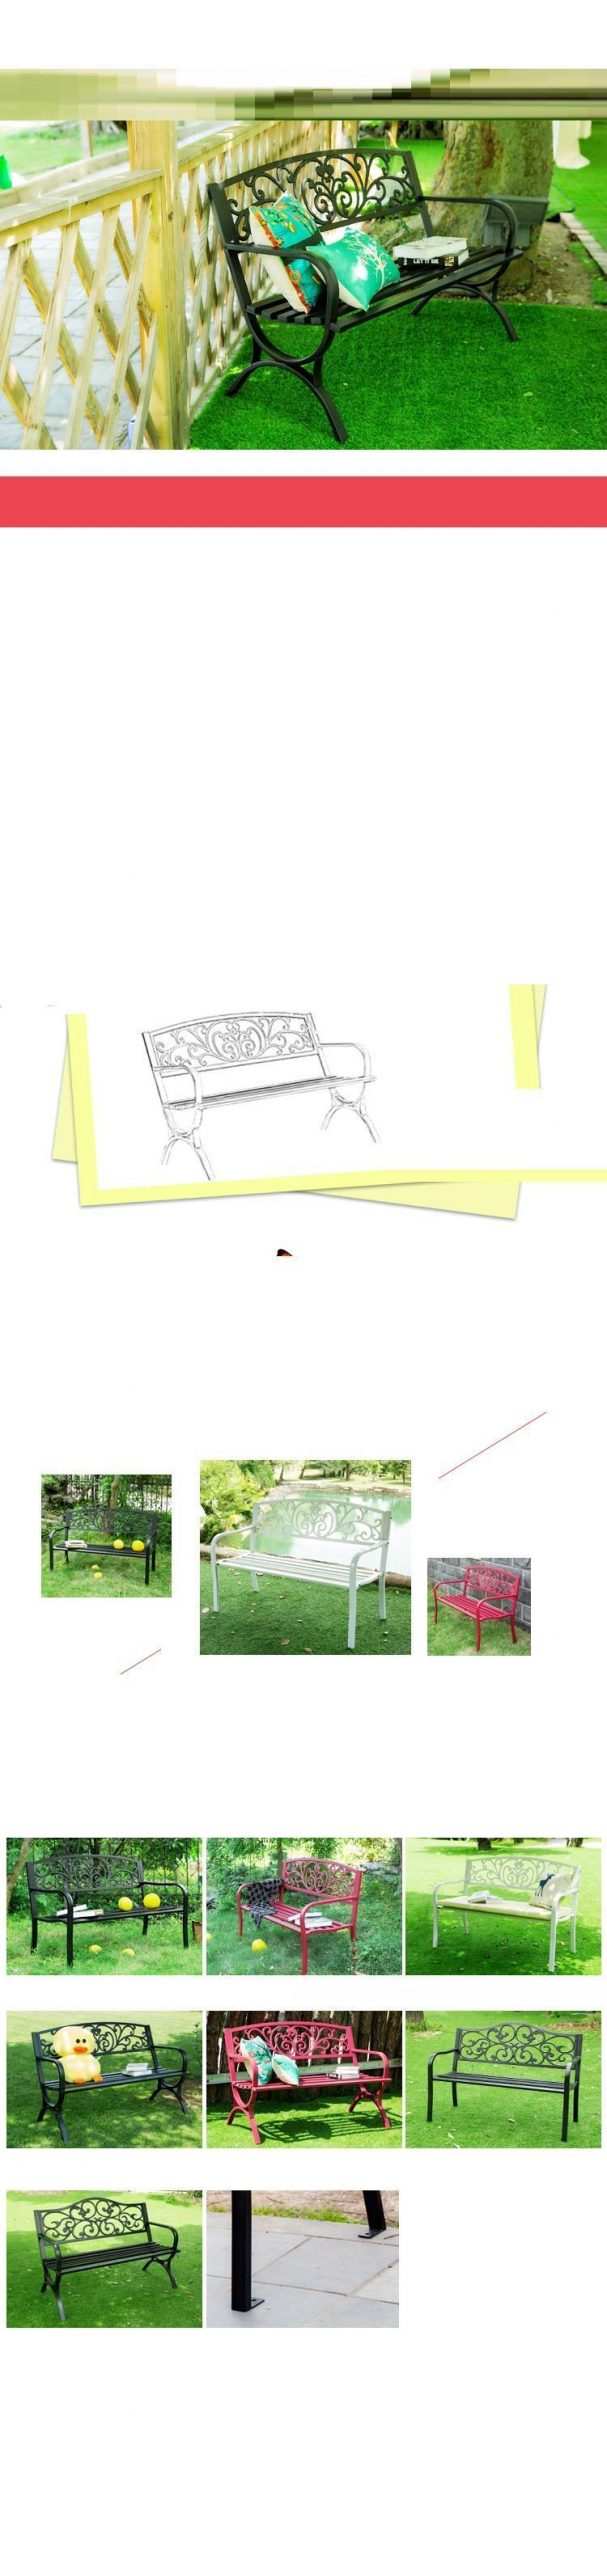 Tuinset Tuinmeubel Silla Moderna Meuble Mobilier Fotel ... dedans Meubles Veranda Jardin